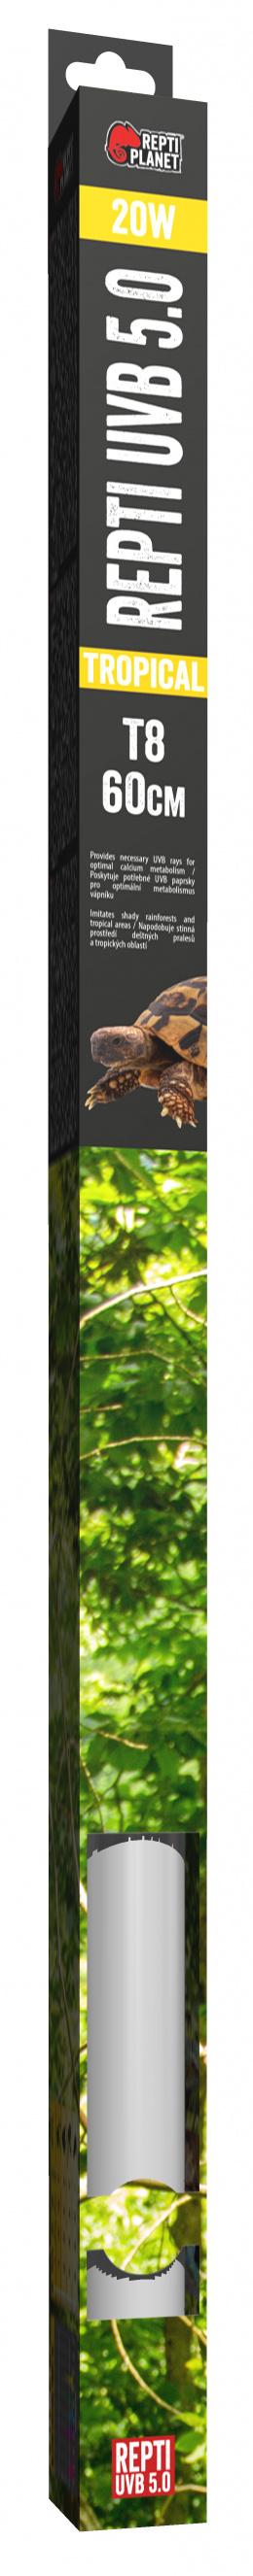 Spuldze terārija lampai - ReptiPlanet Repti T8 UVB 5.0 20W, 60 cm